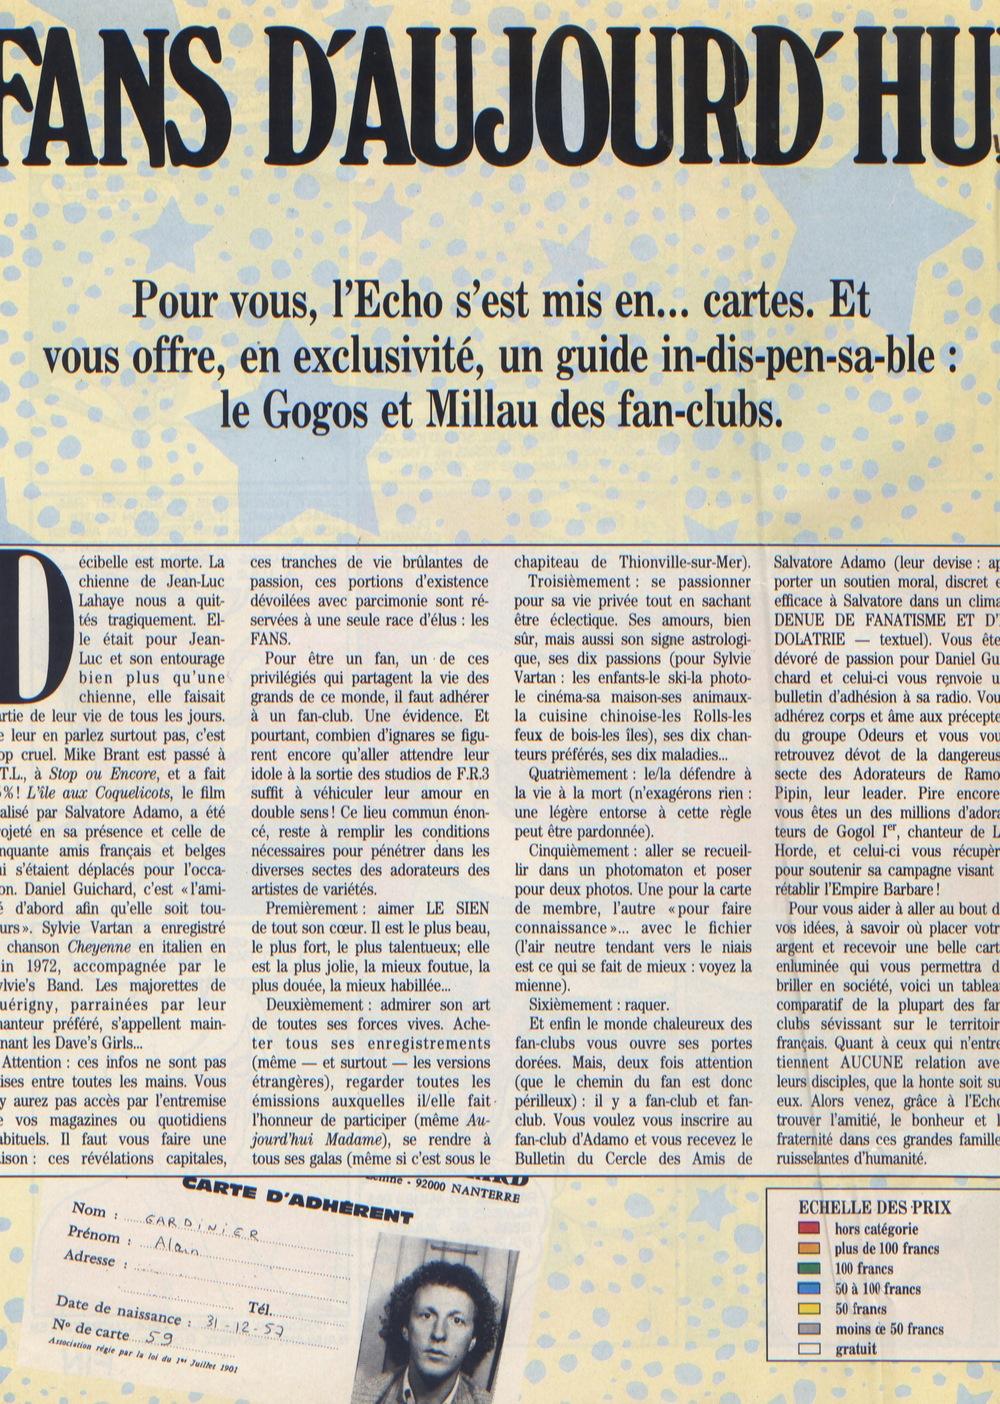 L'ECHO DES SAVANES PAGE 1.jpeg